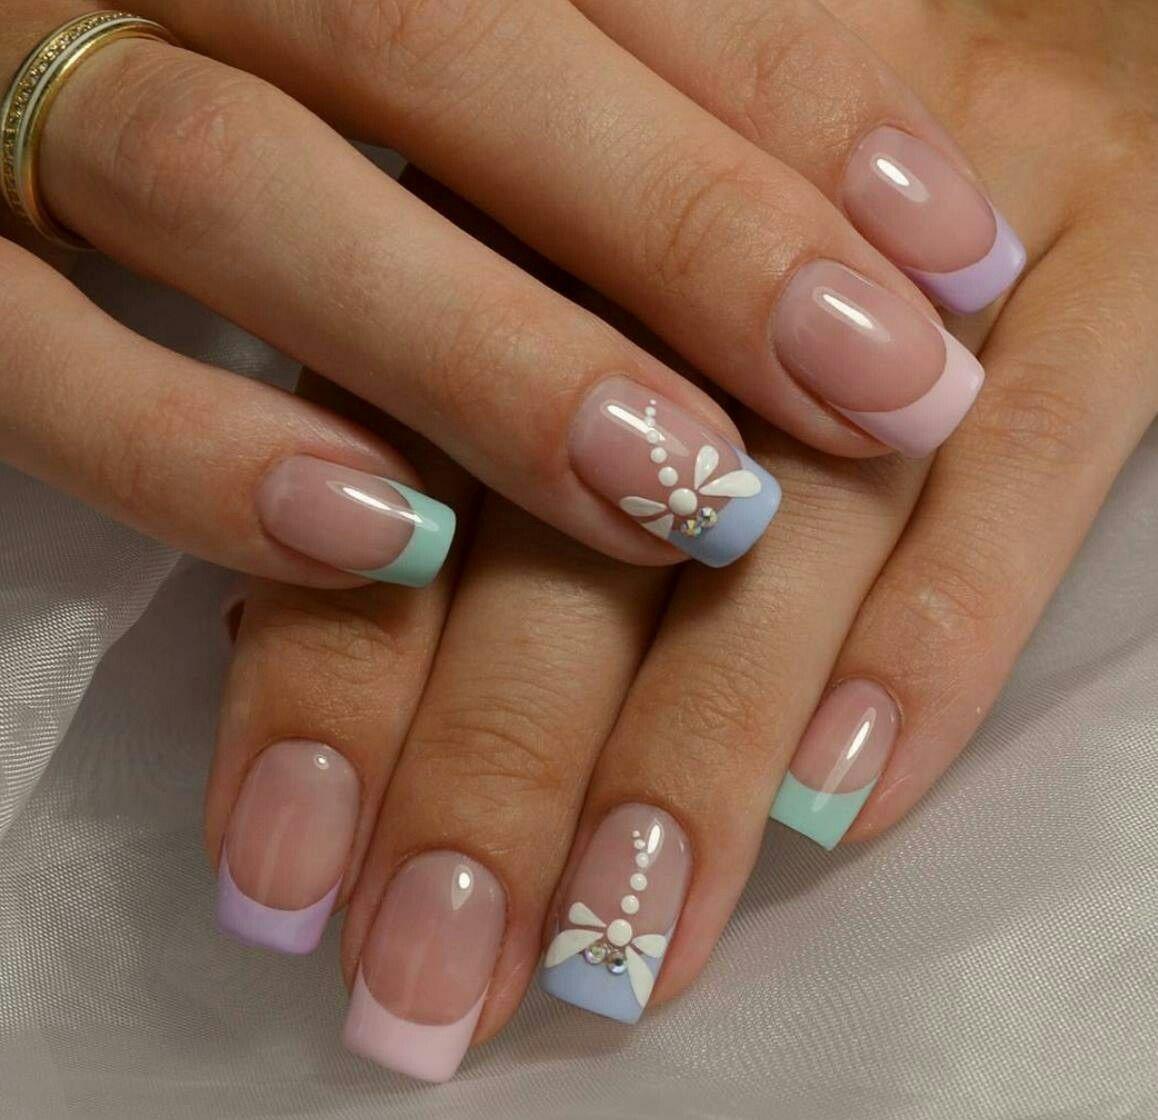 pin kristi tate nails